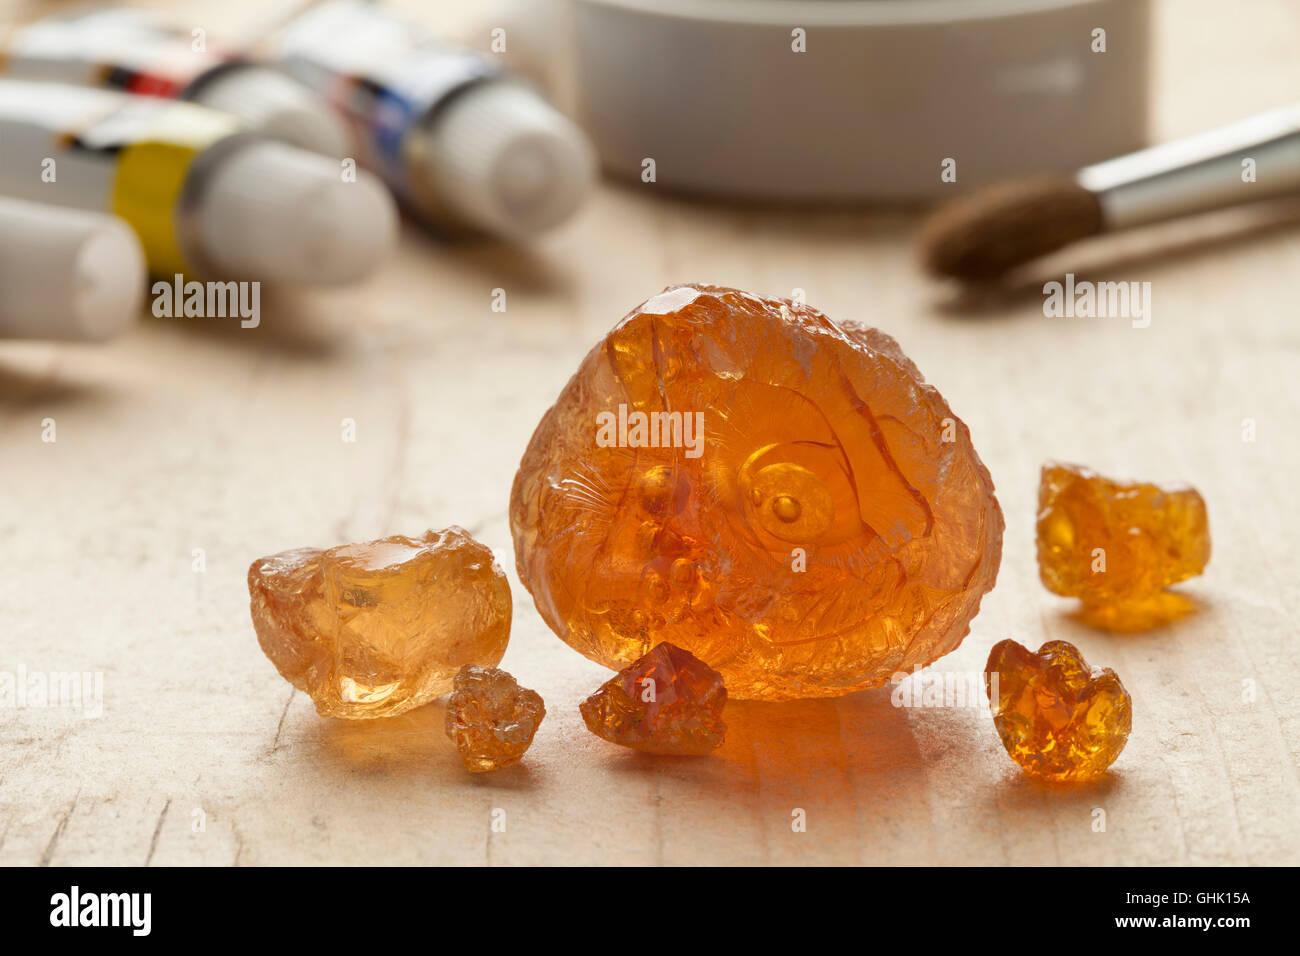 Fixative Stockfotos & Fixative Bilder - Alamy